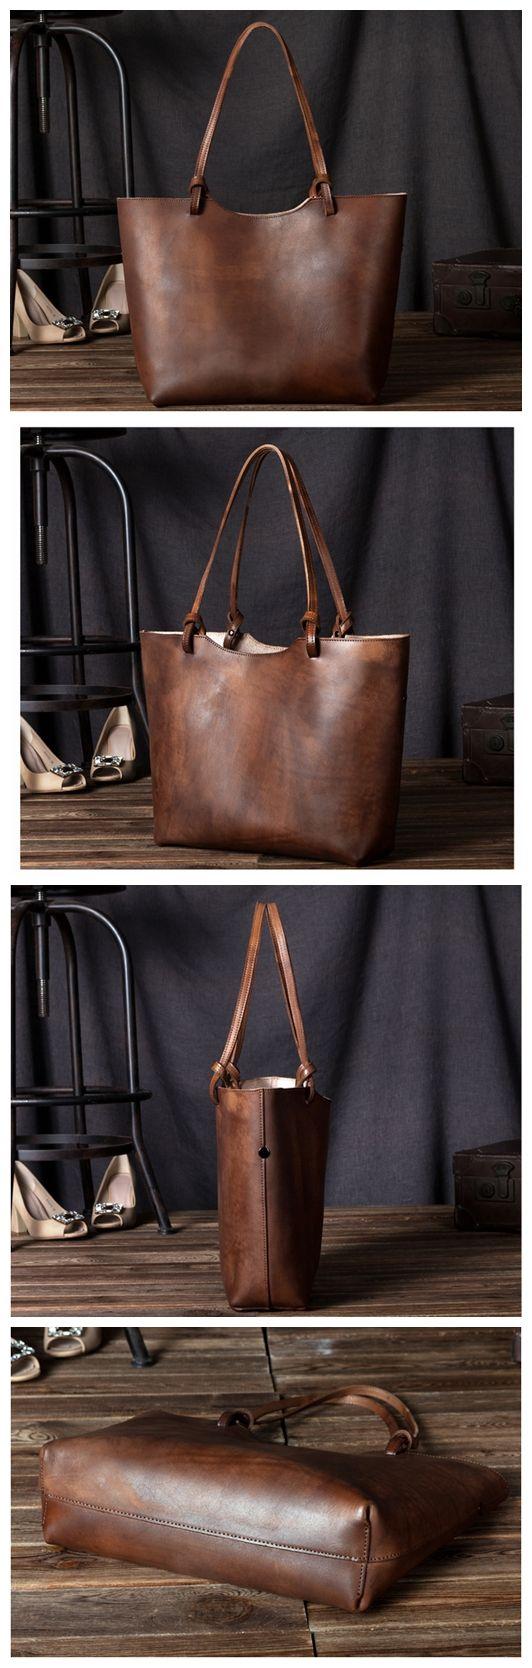 668b85e5fb9d Handmade women fashion leather tote bag shoulder bag handbag shopper bag  C105 Overview: Design  Fashion   Modern Leather Women Tote In Stock  3-5  days For ...